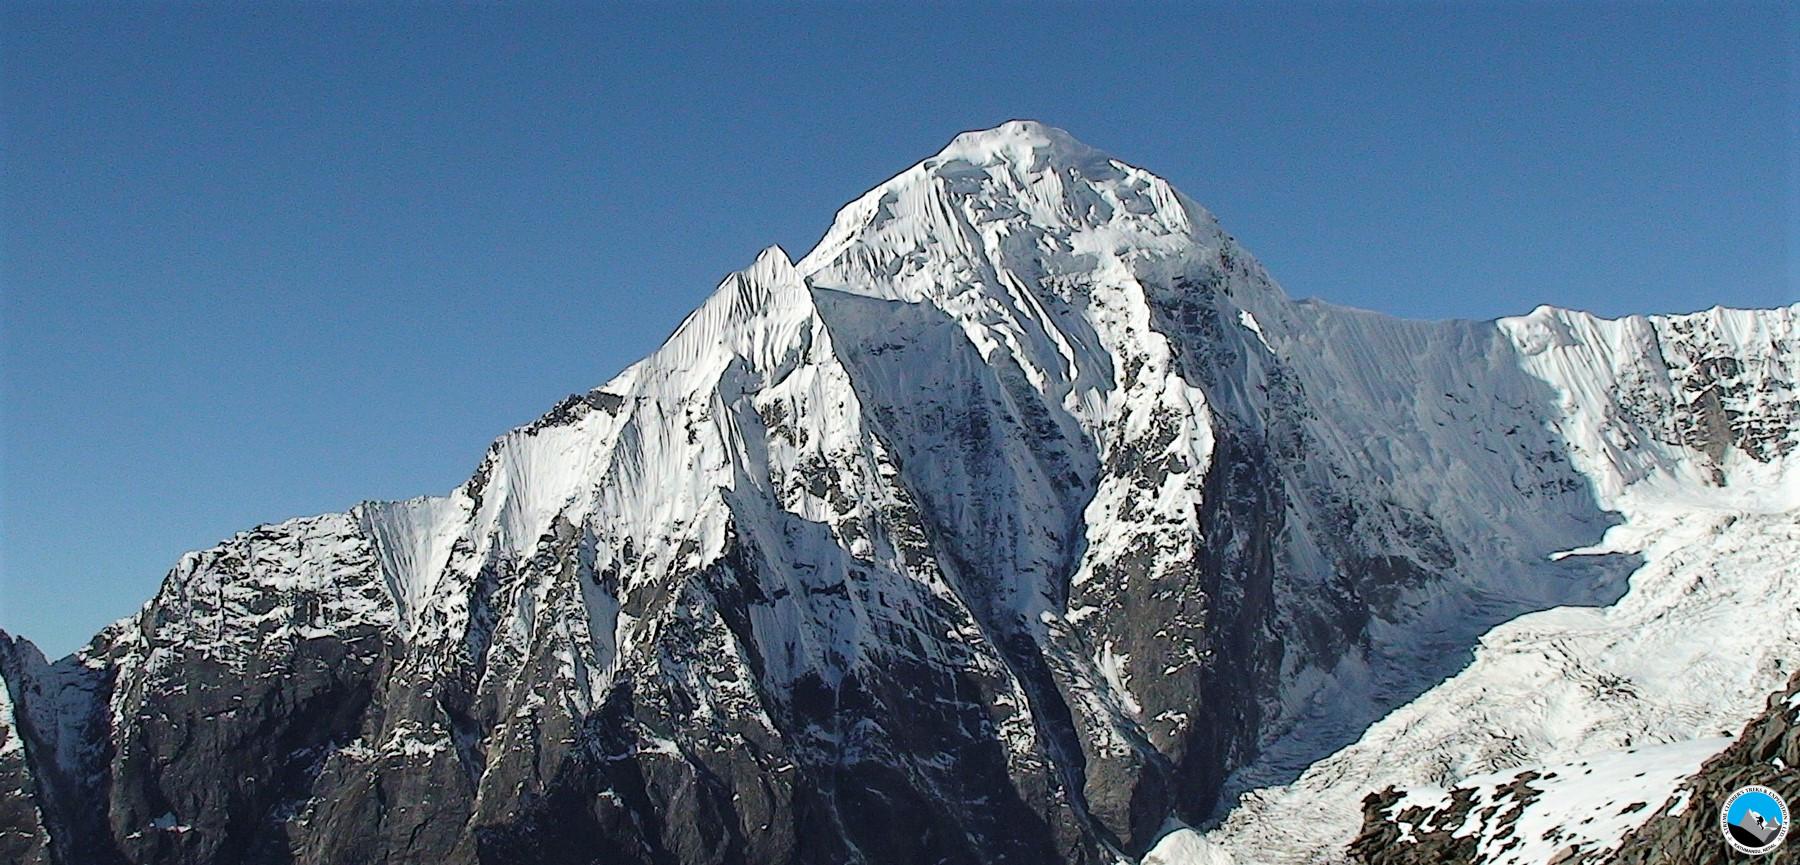 Putha Hiunchuli 7,246m. Expedition via Jomsome